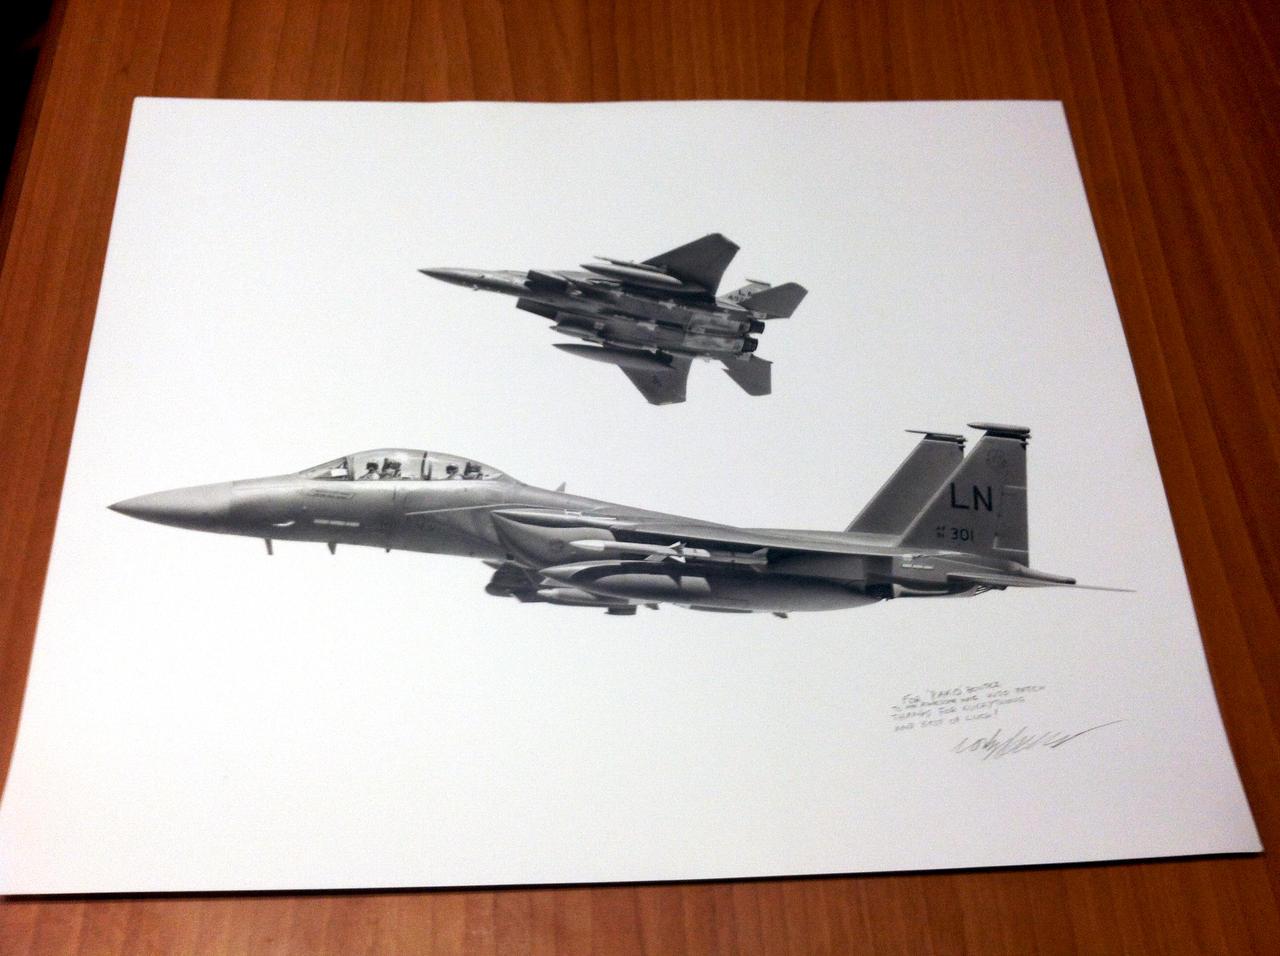 pako_s_f_15e_strike_eagle_commission_by_sketchh22-d86mx9c.jpg